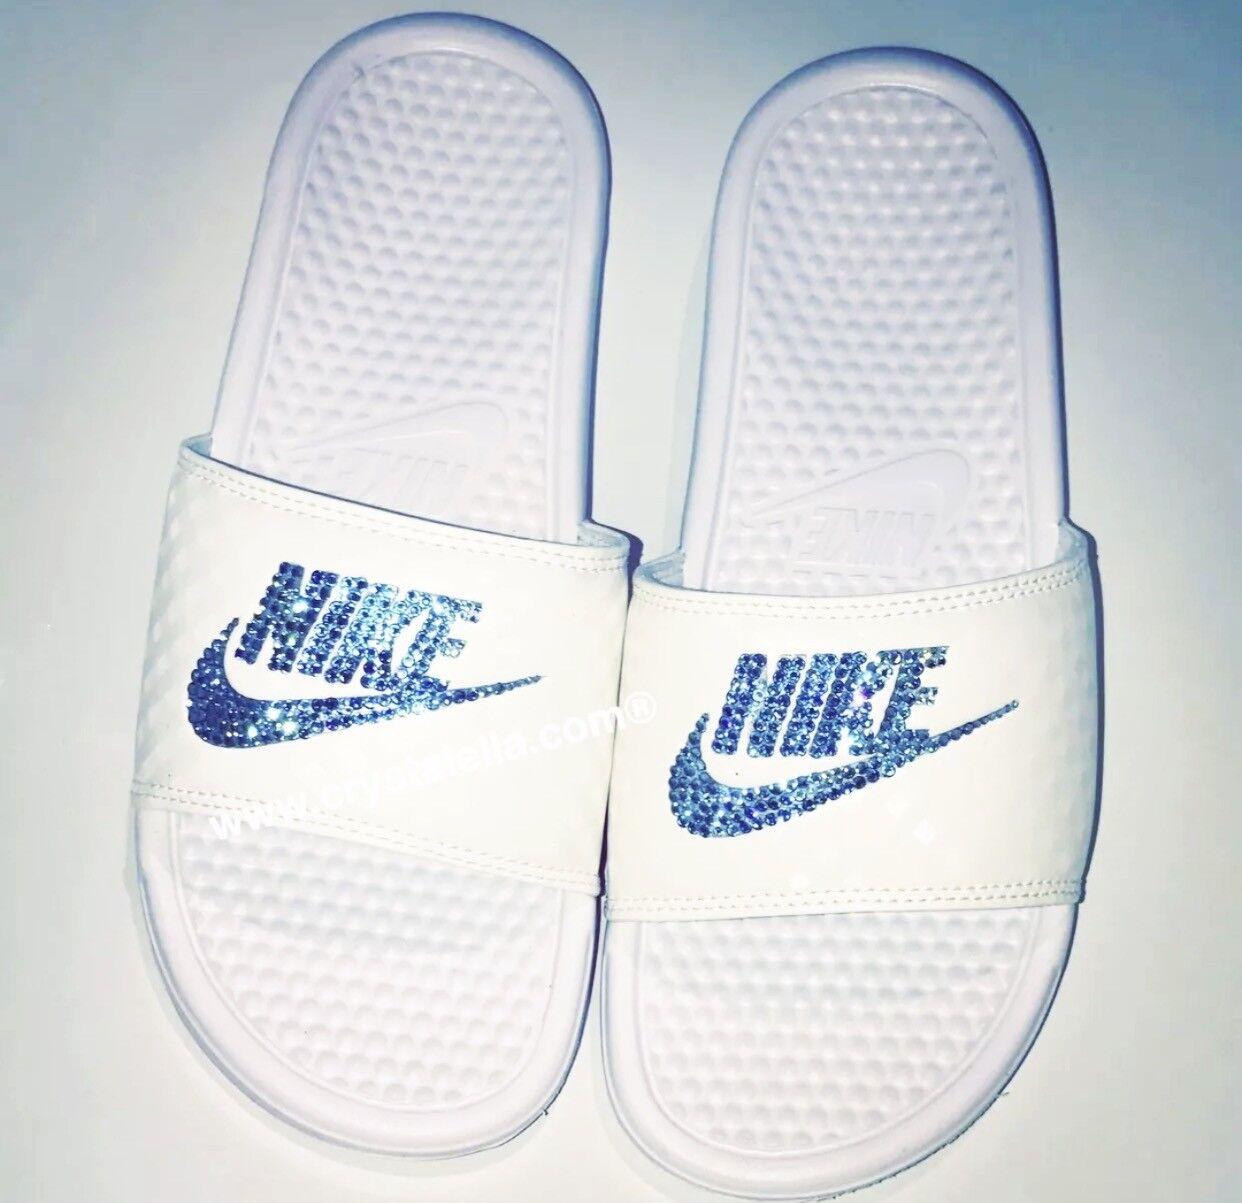 Bquamarin Nike Benassi Sandalen/Zehentrenner Echt Swarovski Kristall Brandneu